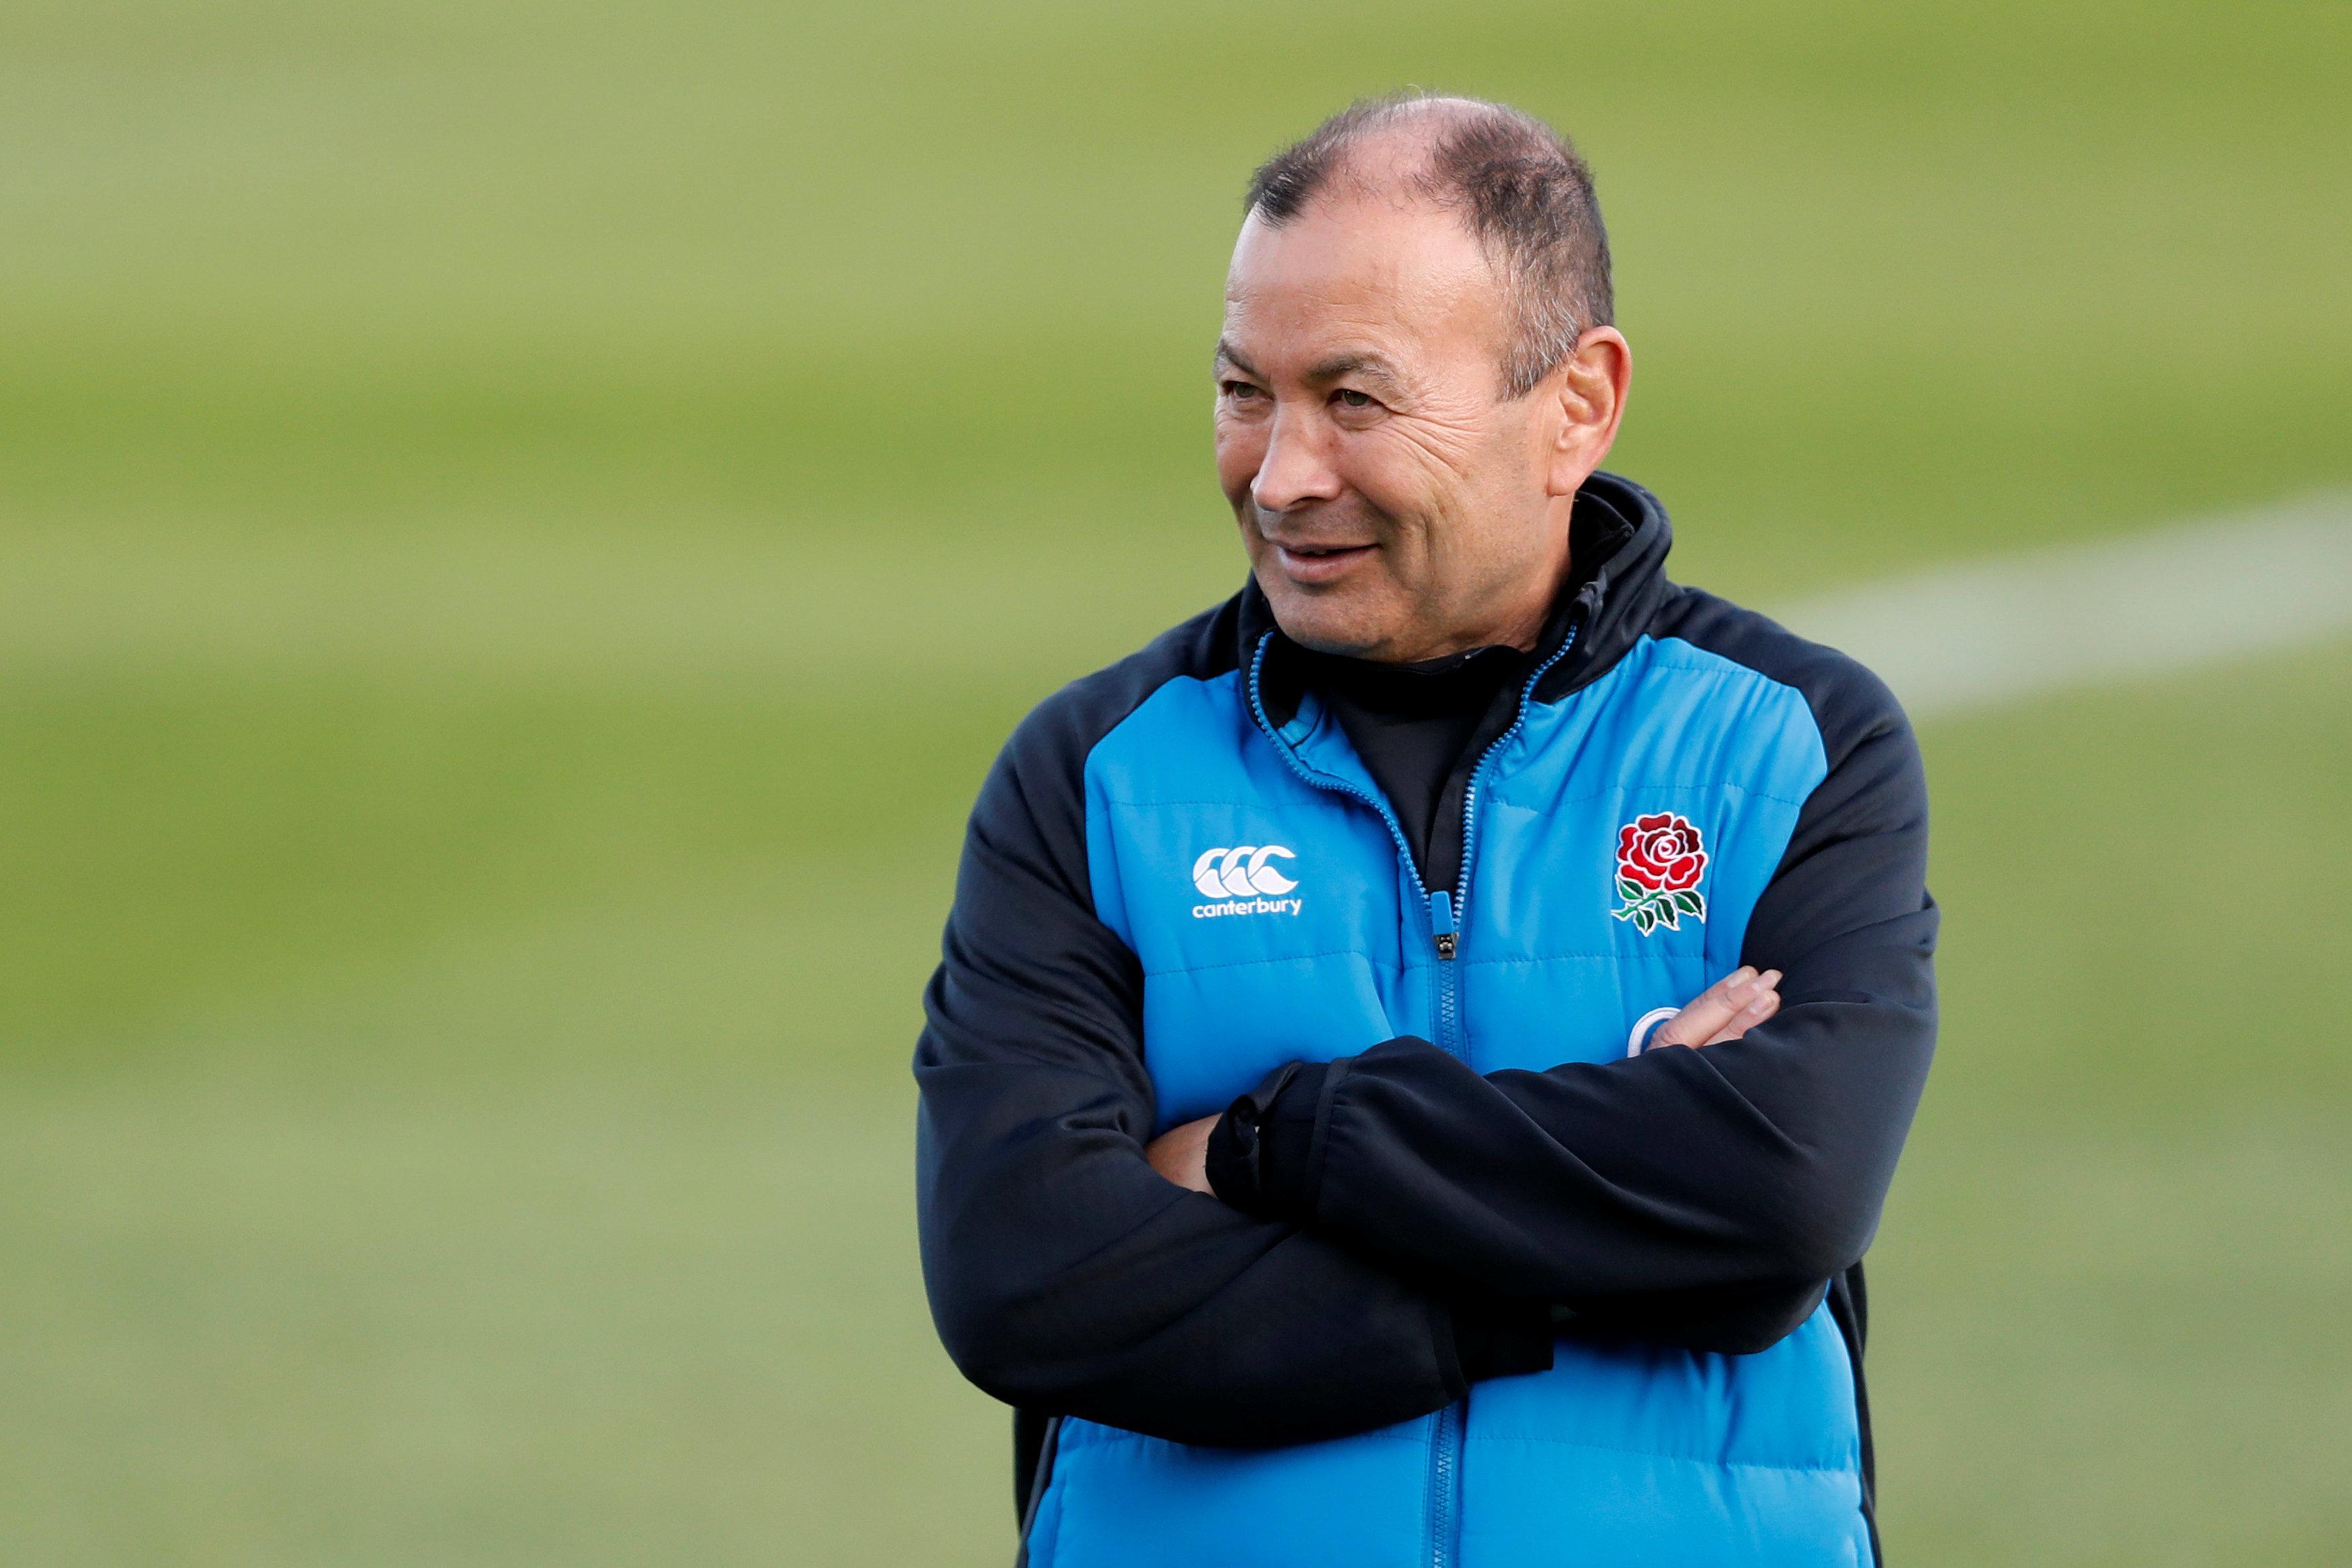 Eddie Jones' selection headache ahead of the autumn internationals is worsening